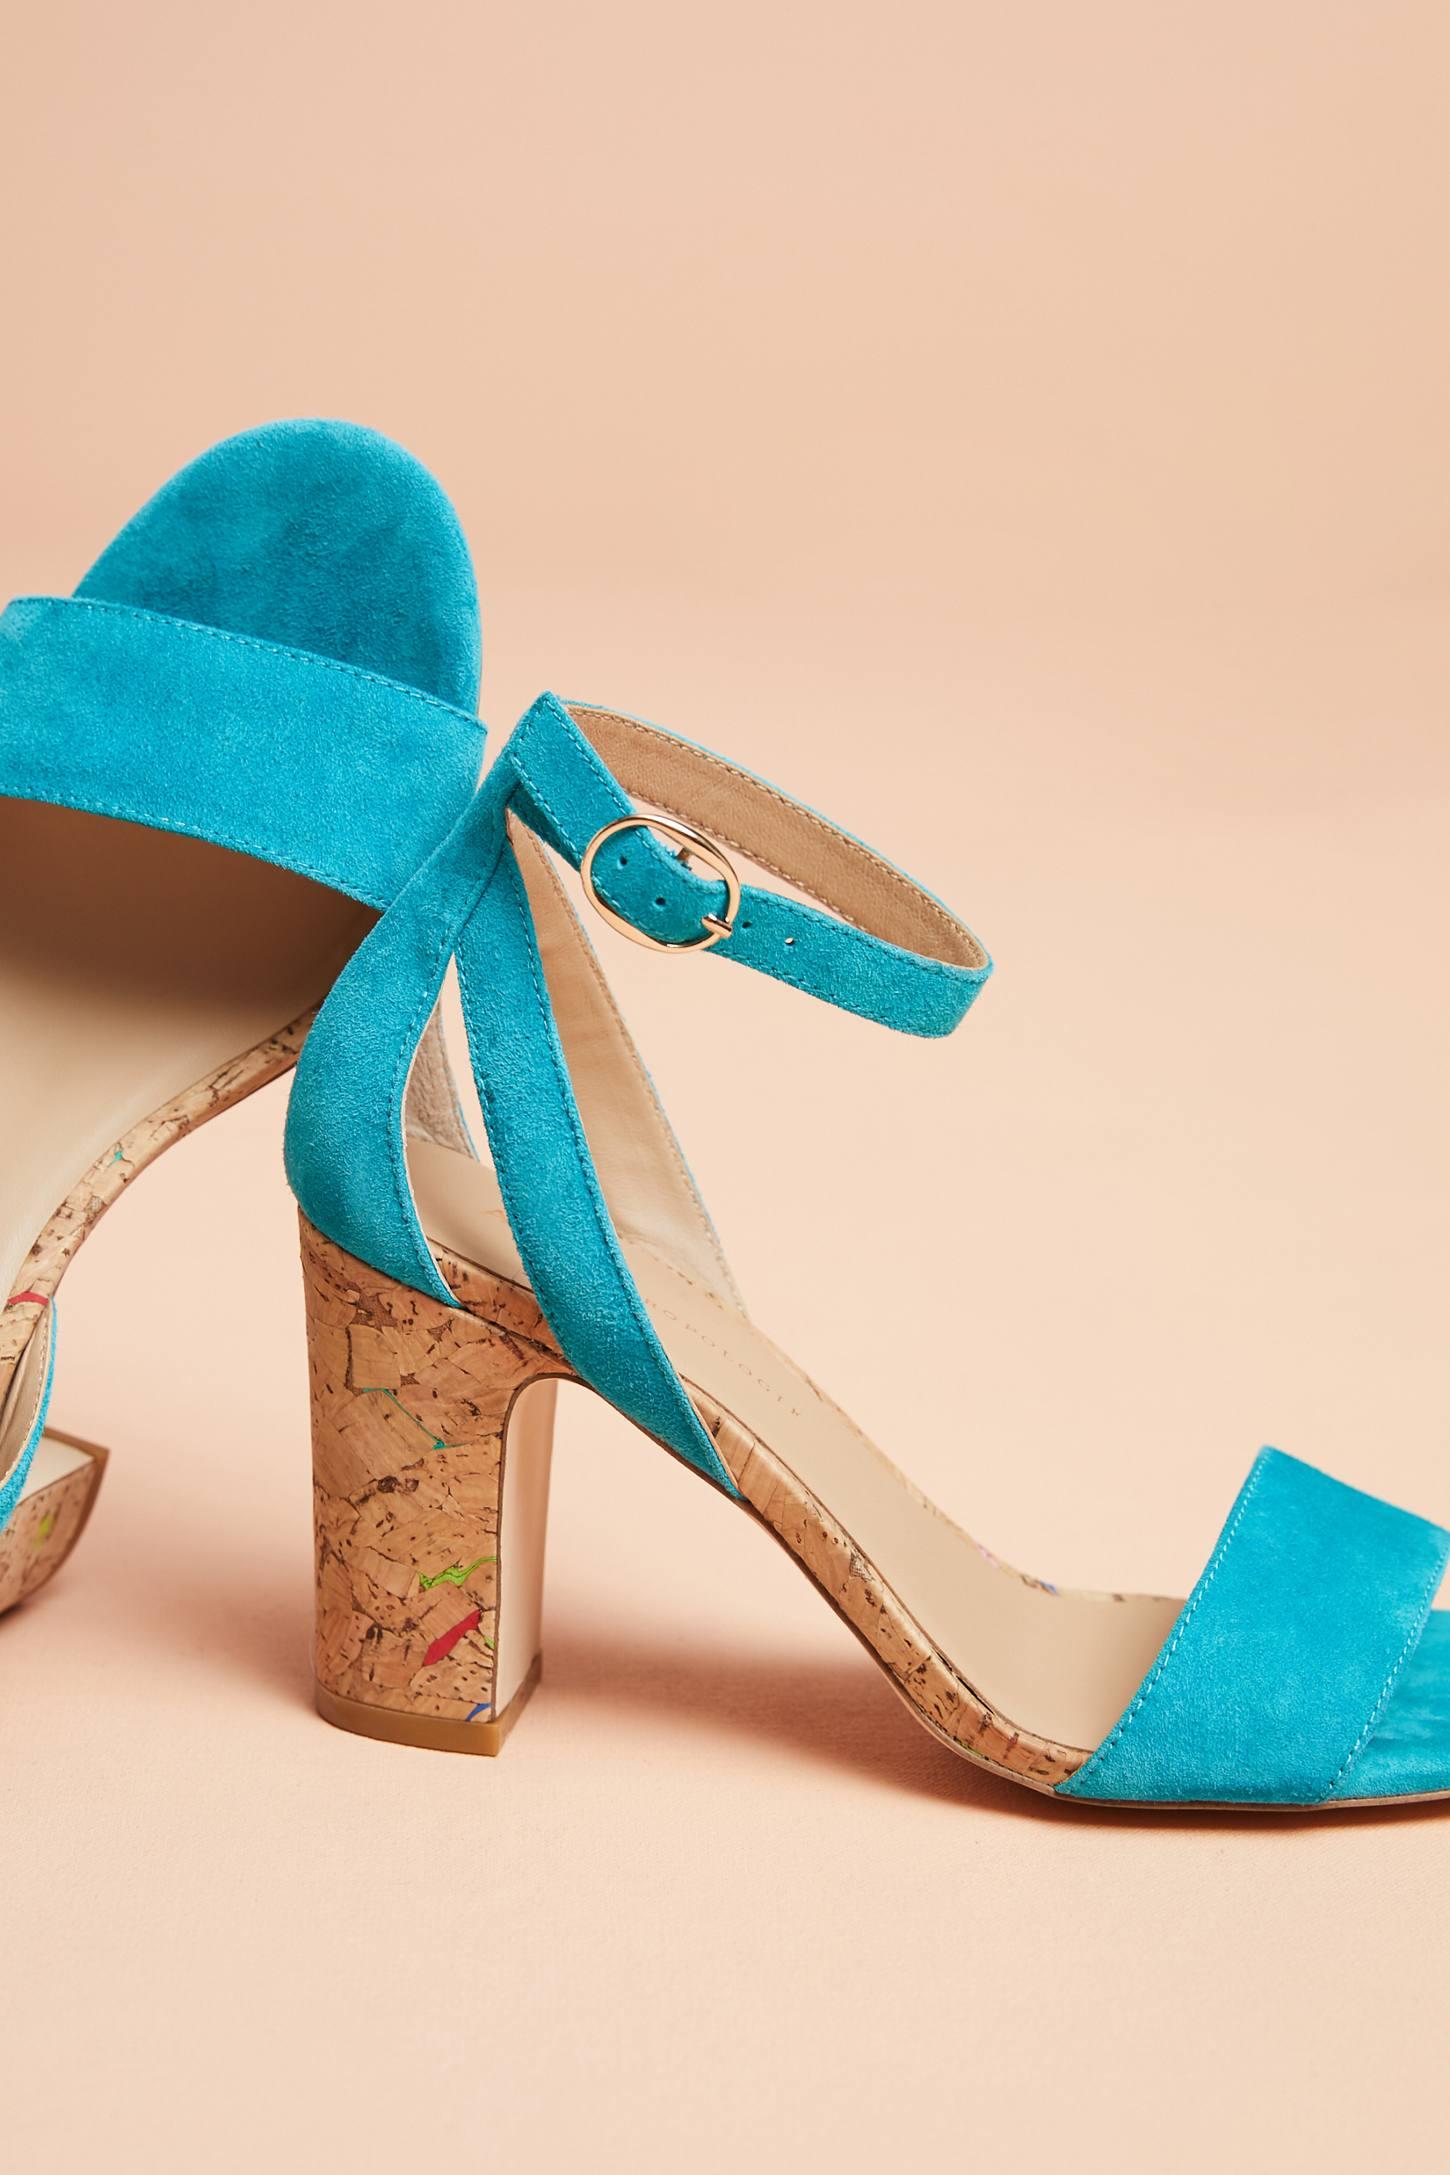 Anthropologie Femme Cork Heels